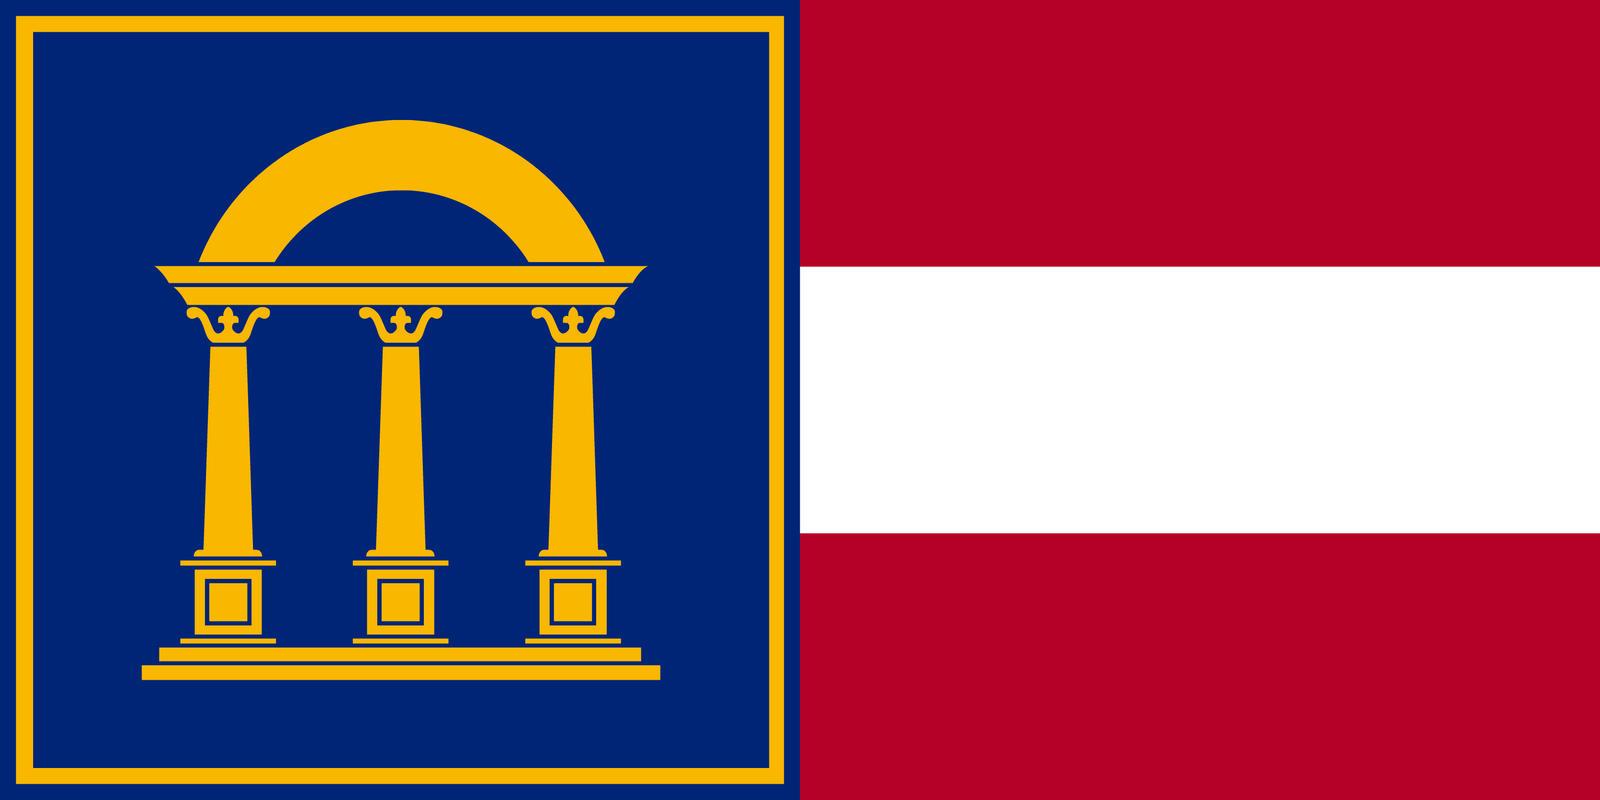 georgia flag 2017 - photo #29